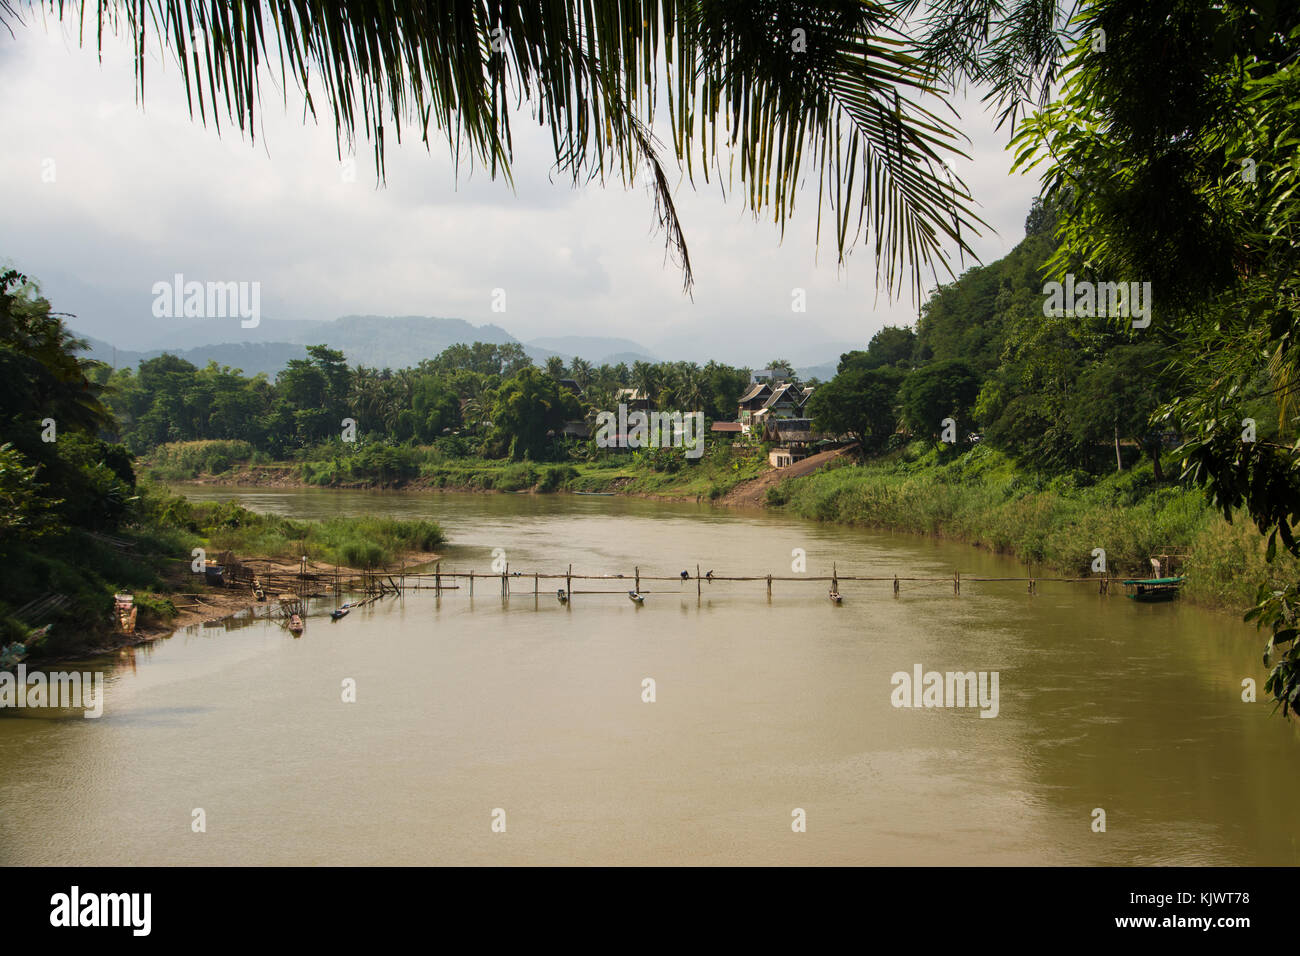 Gebäude der Bamboo Brücke über den Nam Khan in Luang Prabang, Laos Stockbild